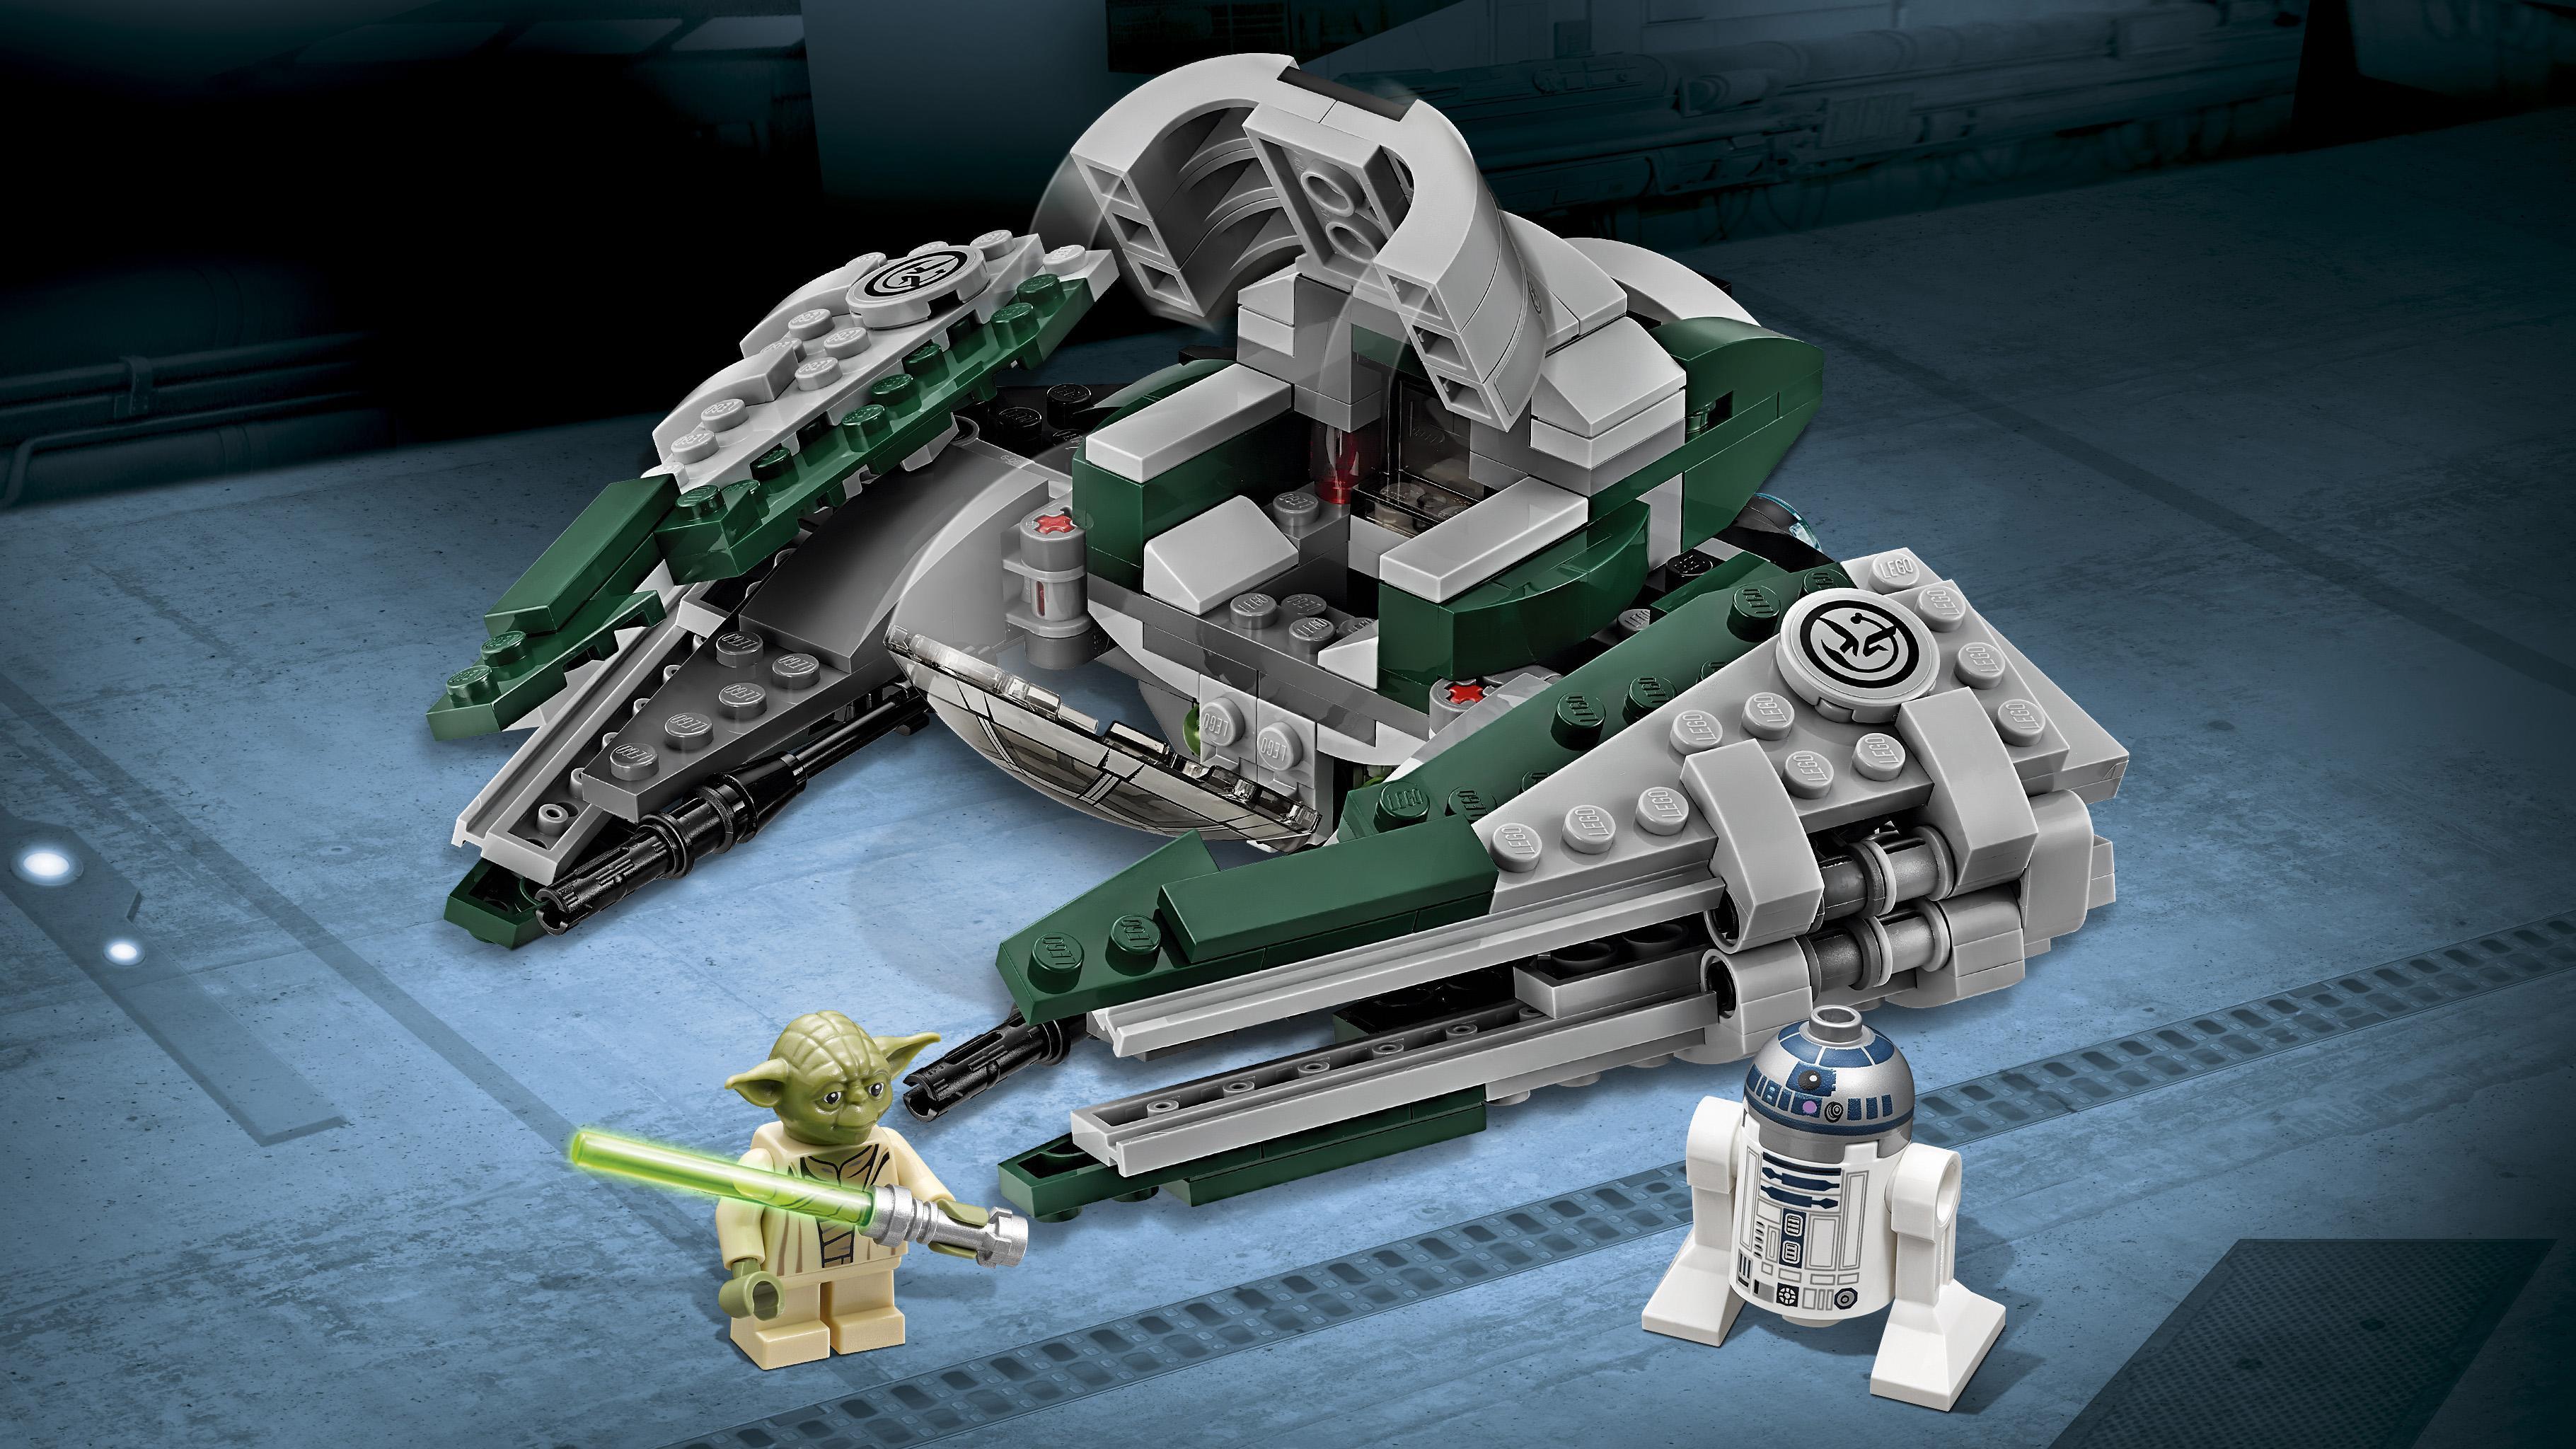 Lego star wars yoda 39 s jedi starfighter 75168 - Lego star warse ...